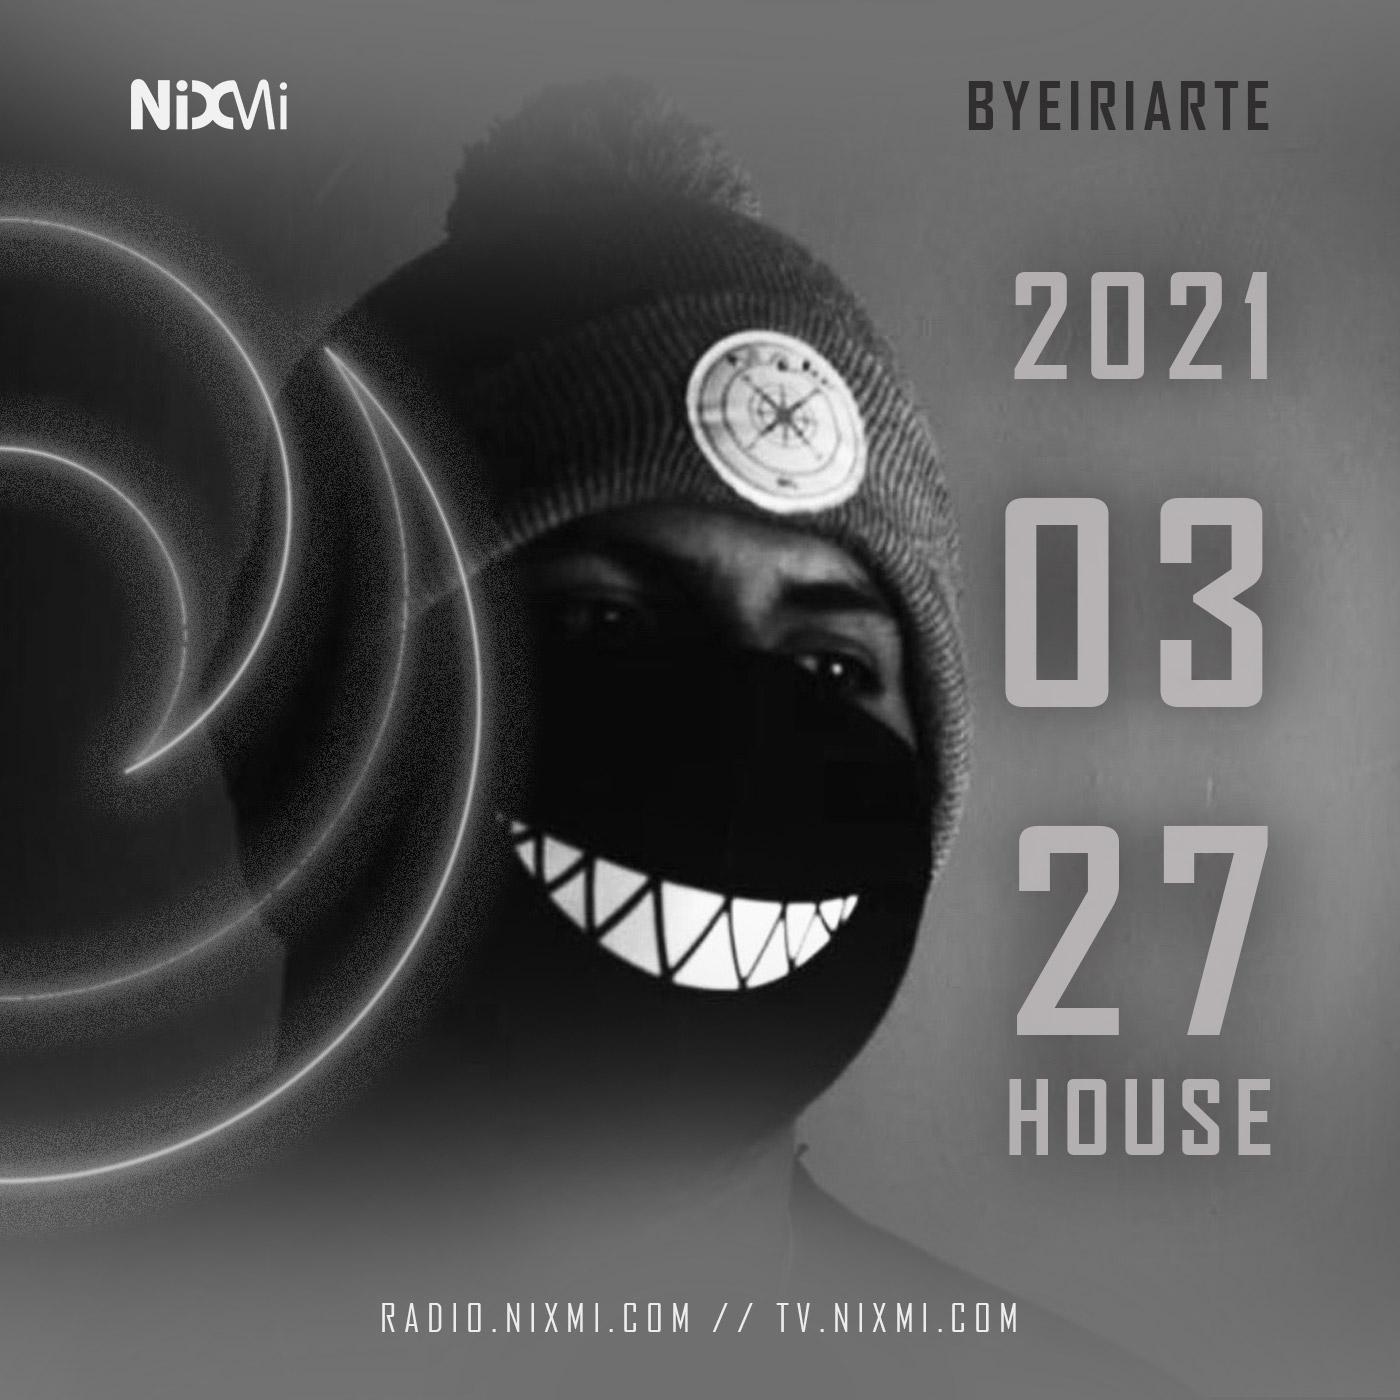 2021—PODCAST-BYEIRIARTE-NIXMI